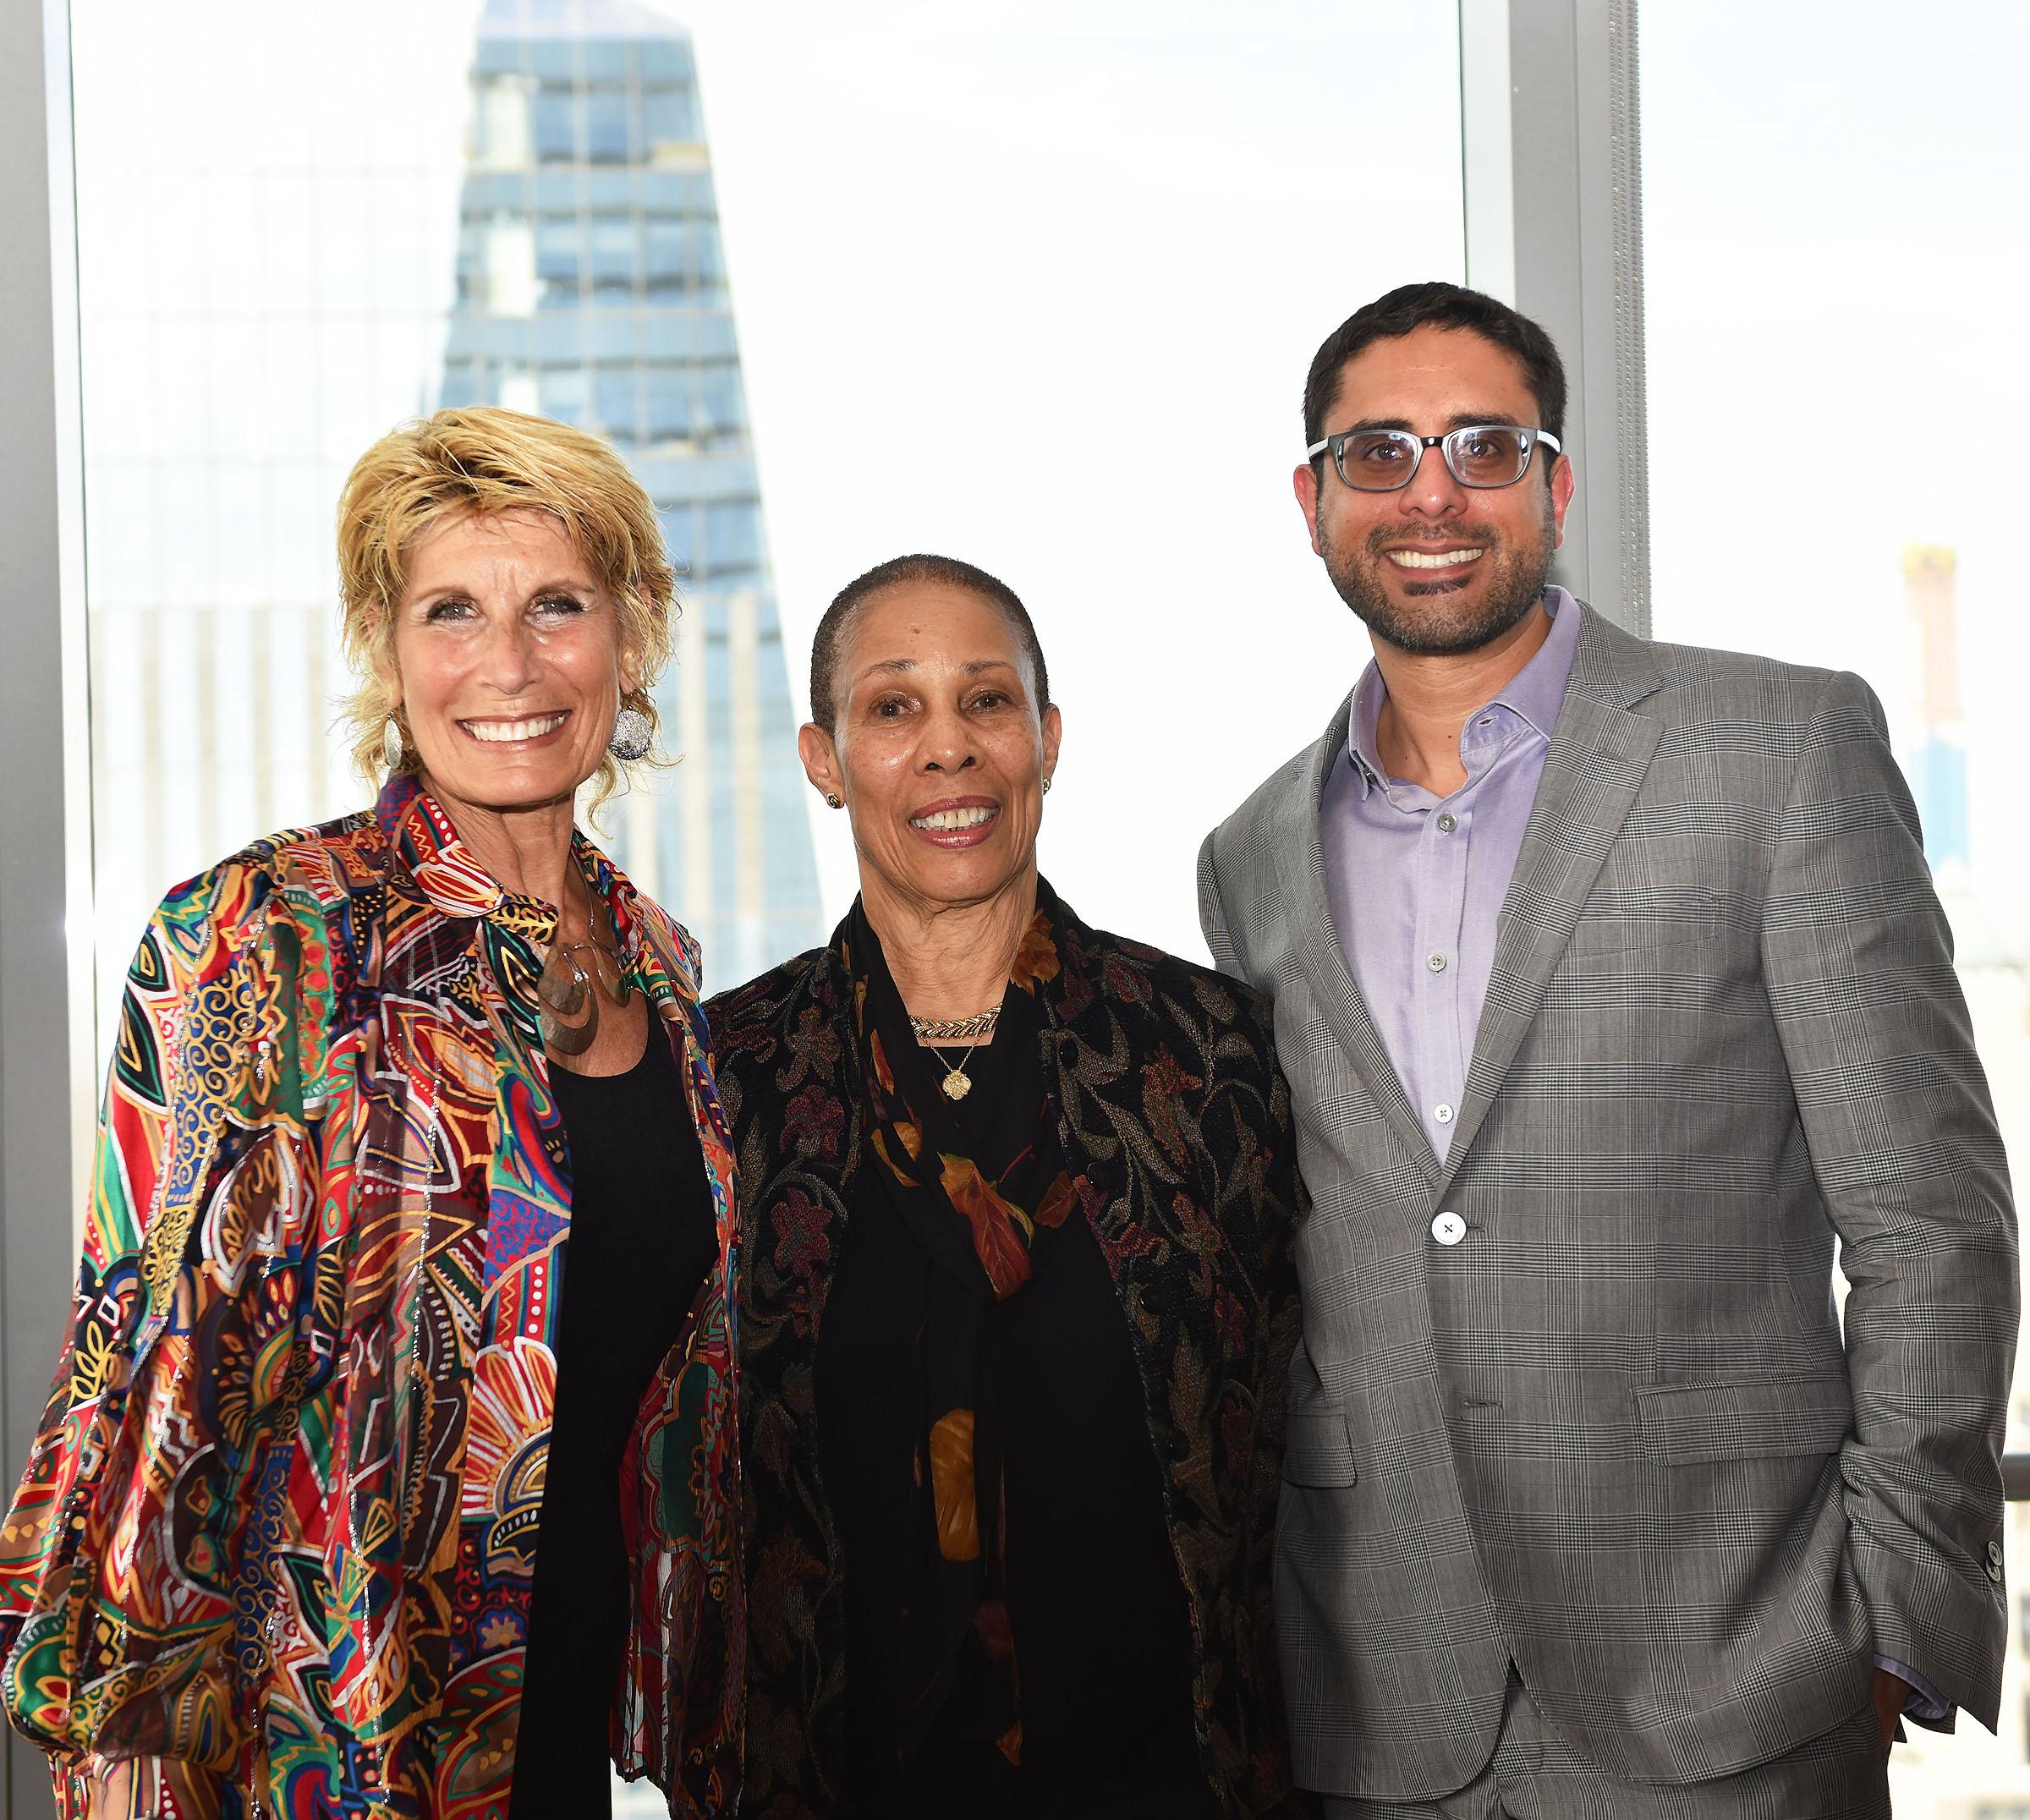 Bonnie Low-Kramen, Melba Duncan, and Al-Husein Madhany